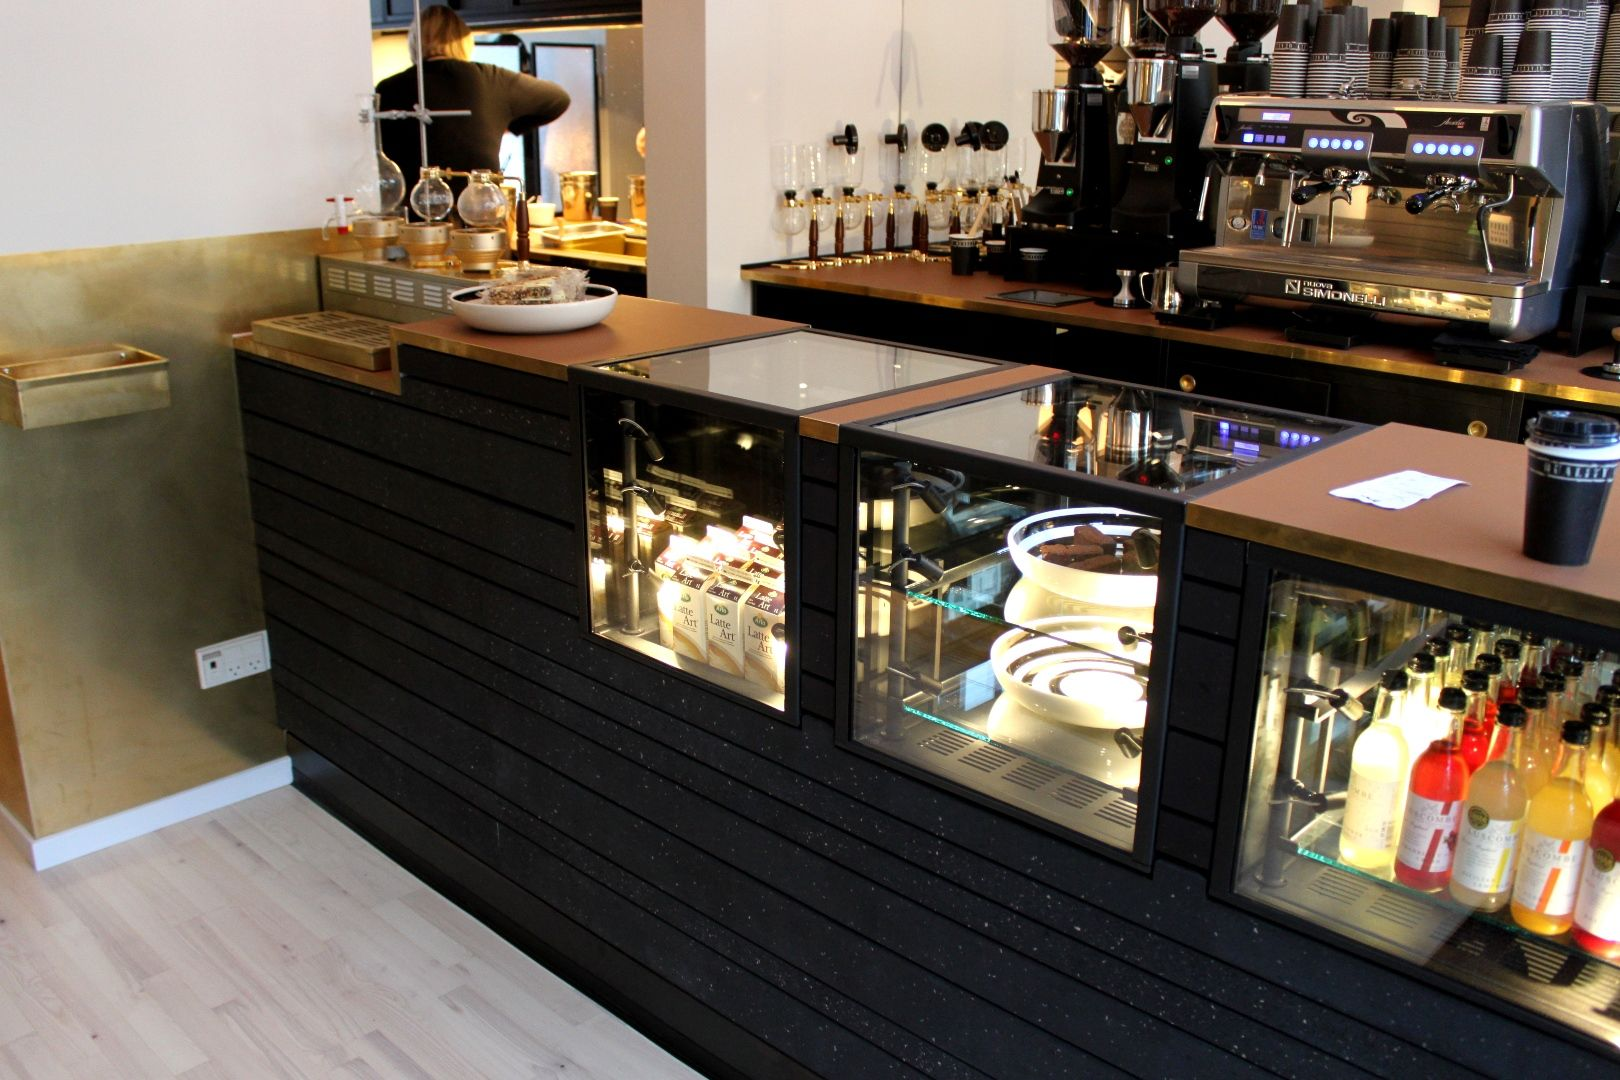 khler coffee aarhus denmark design soren vester black inked composite brass and